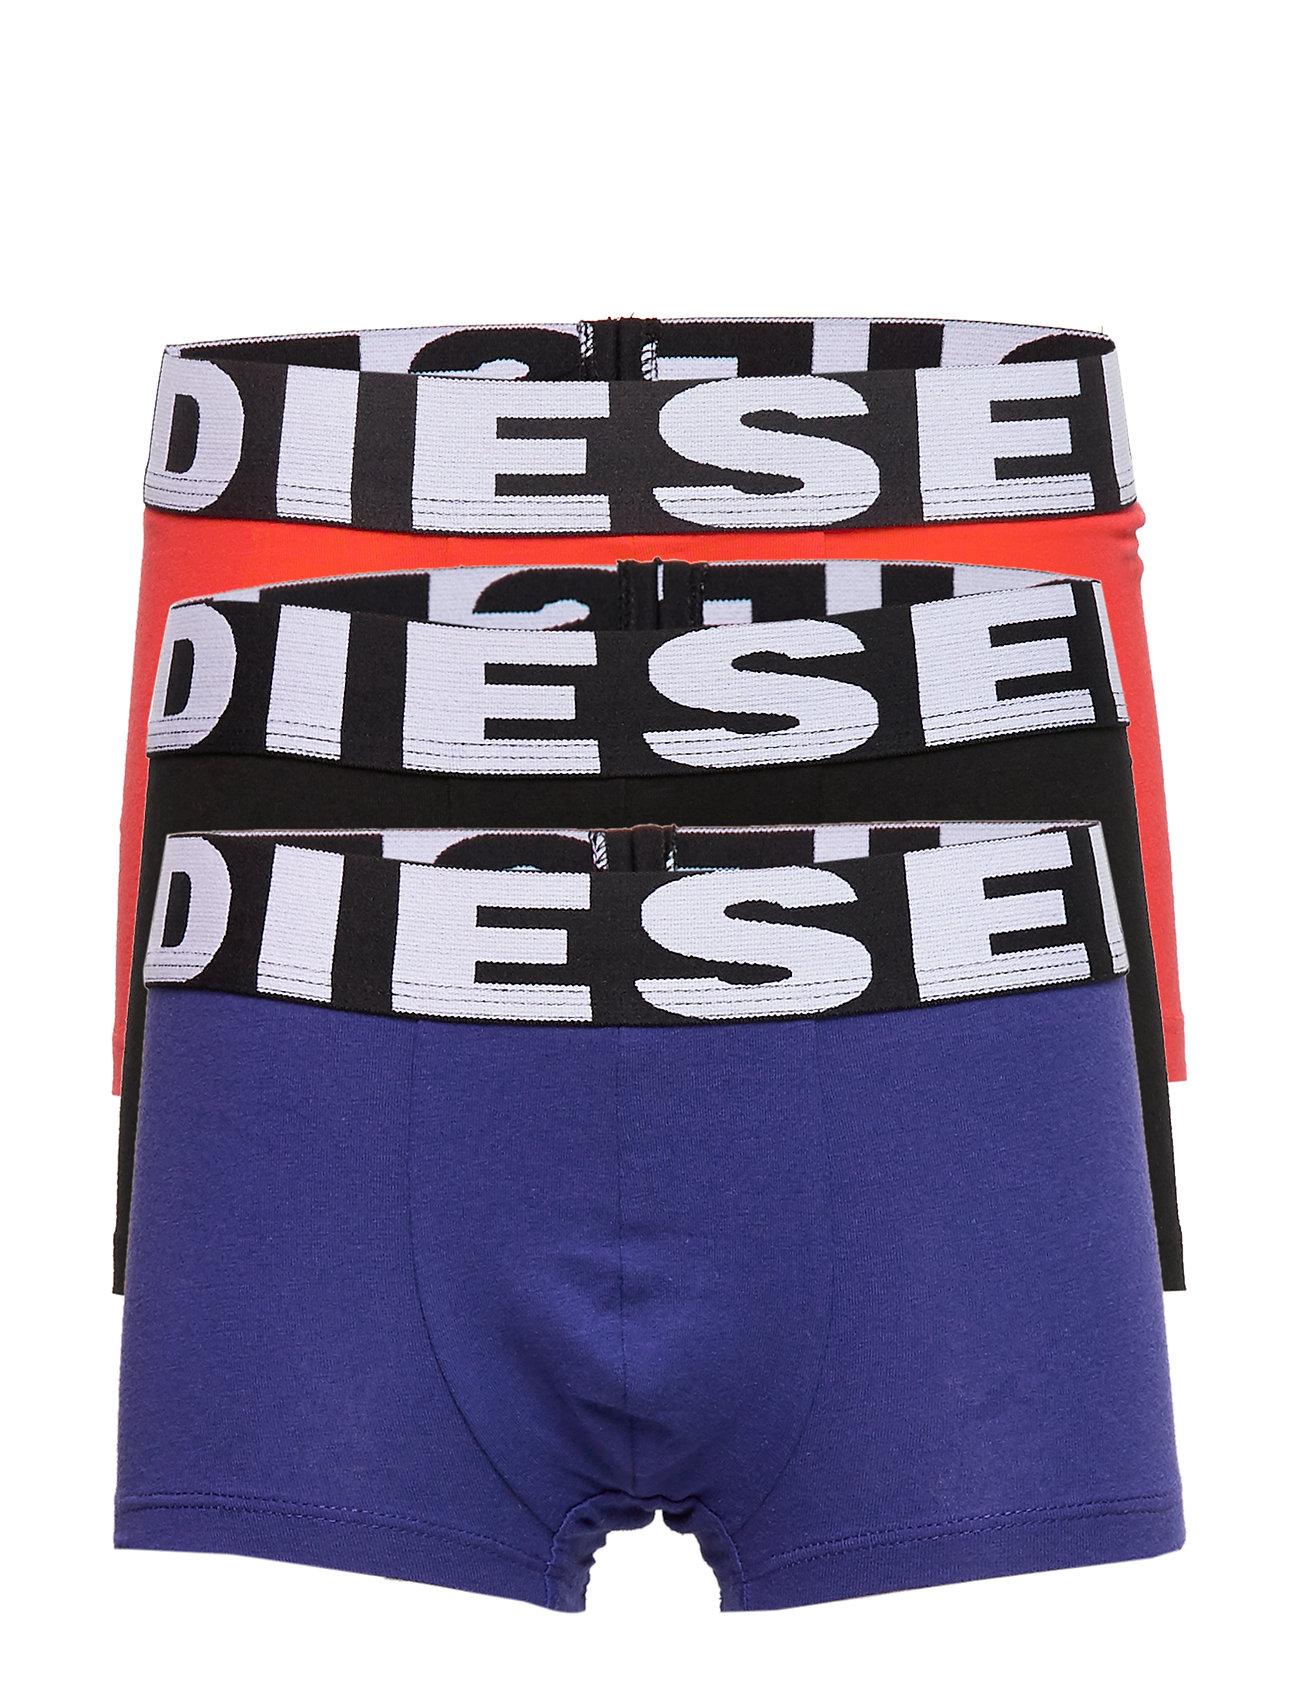 Diesel UMBX-USHAWNTHREEPACK BOXER -SHORTS - BLACK+BLUETTE+RED